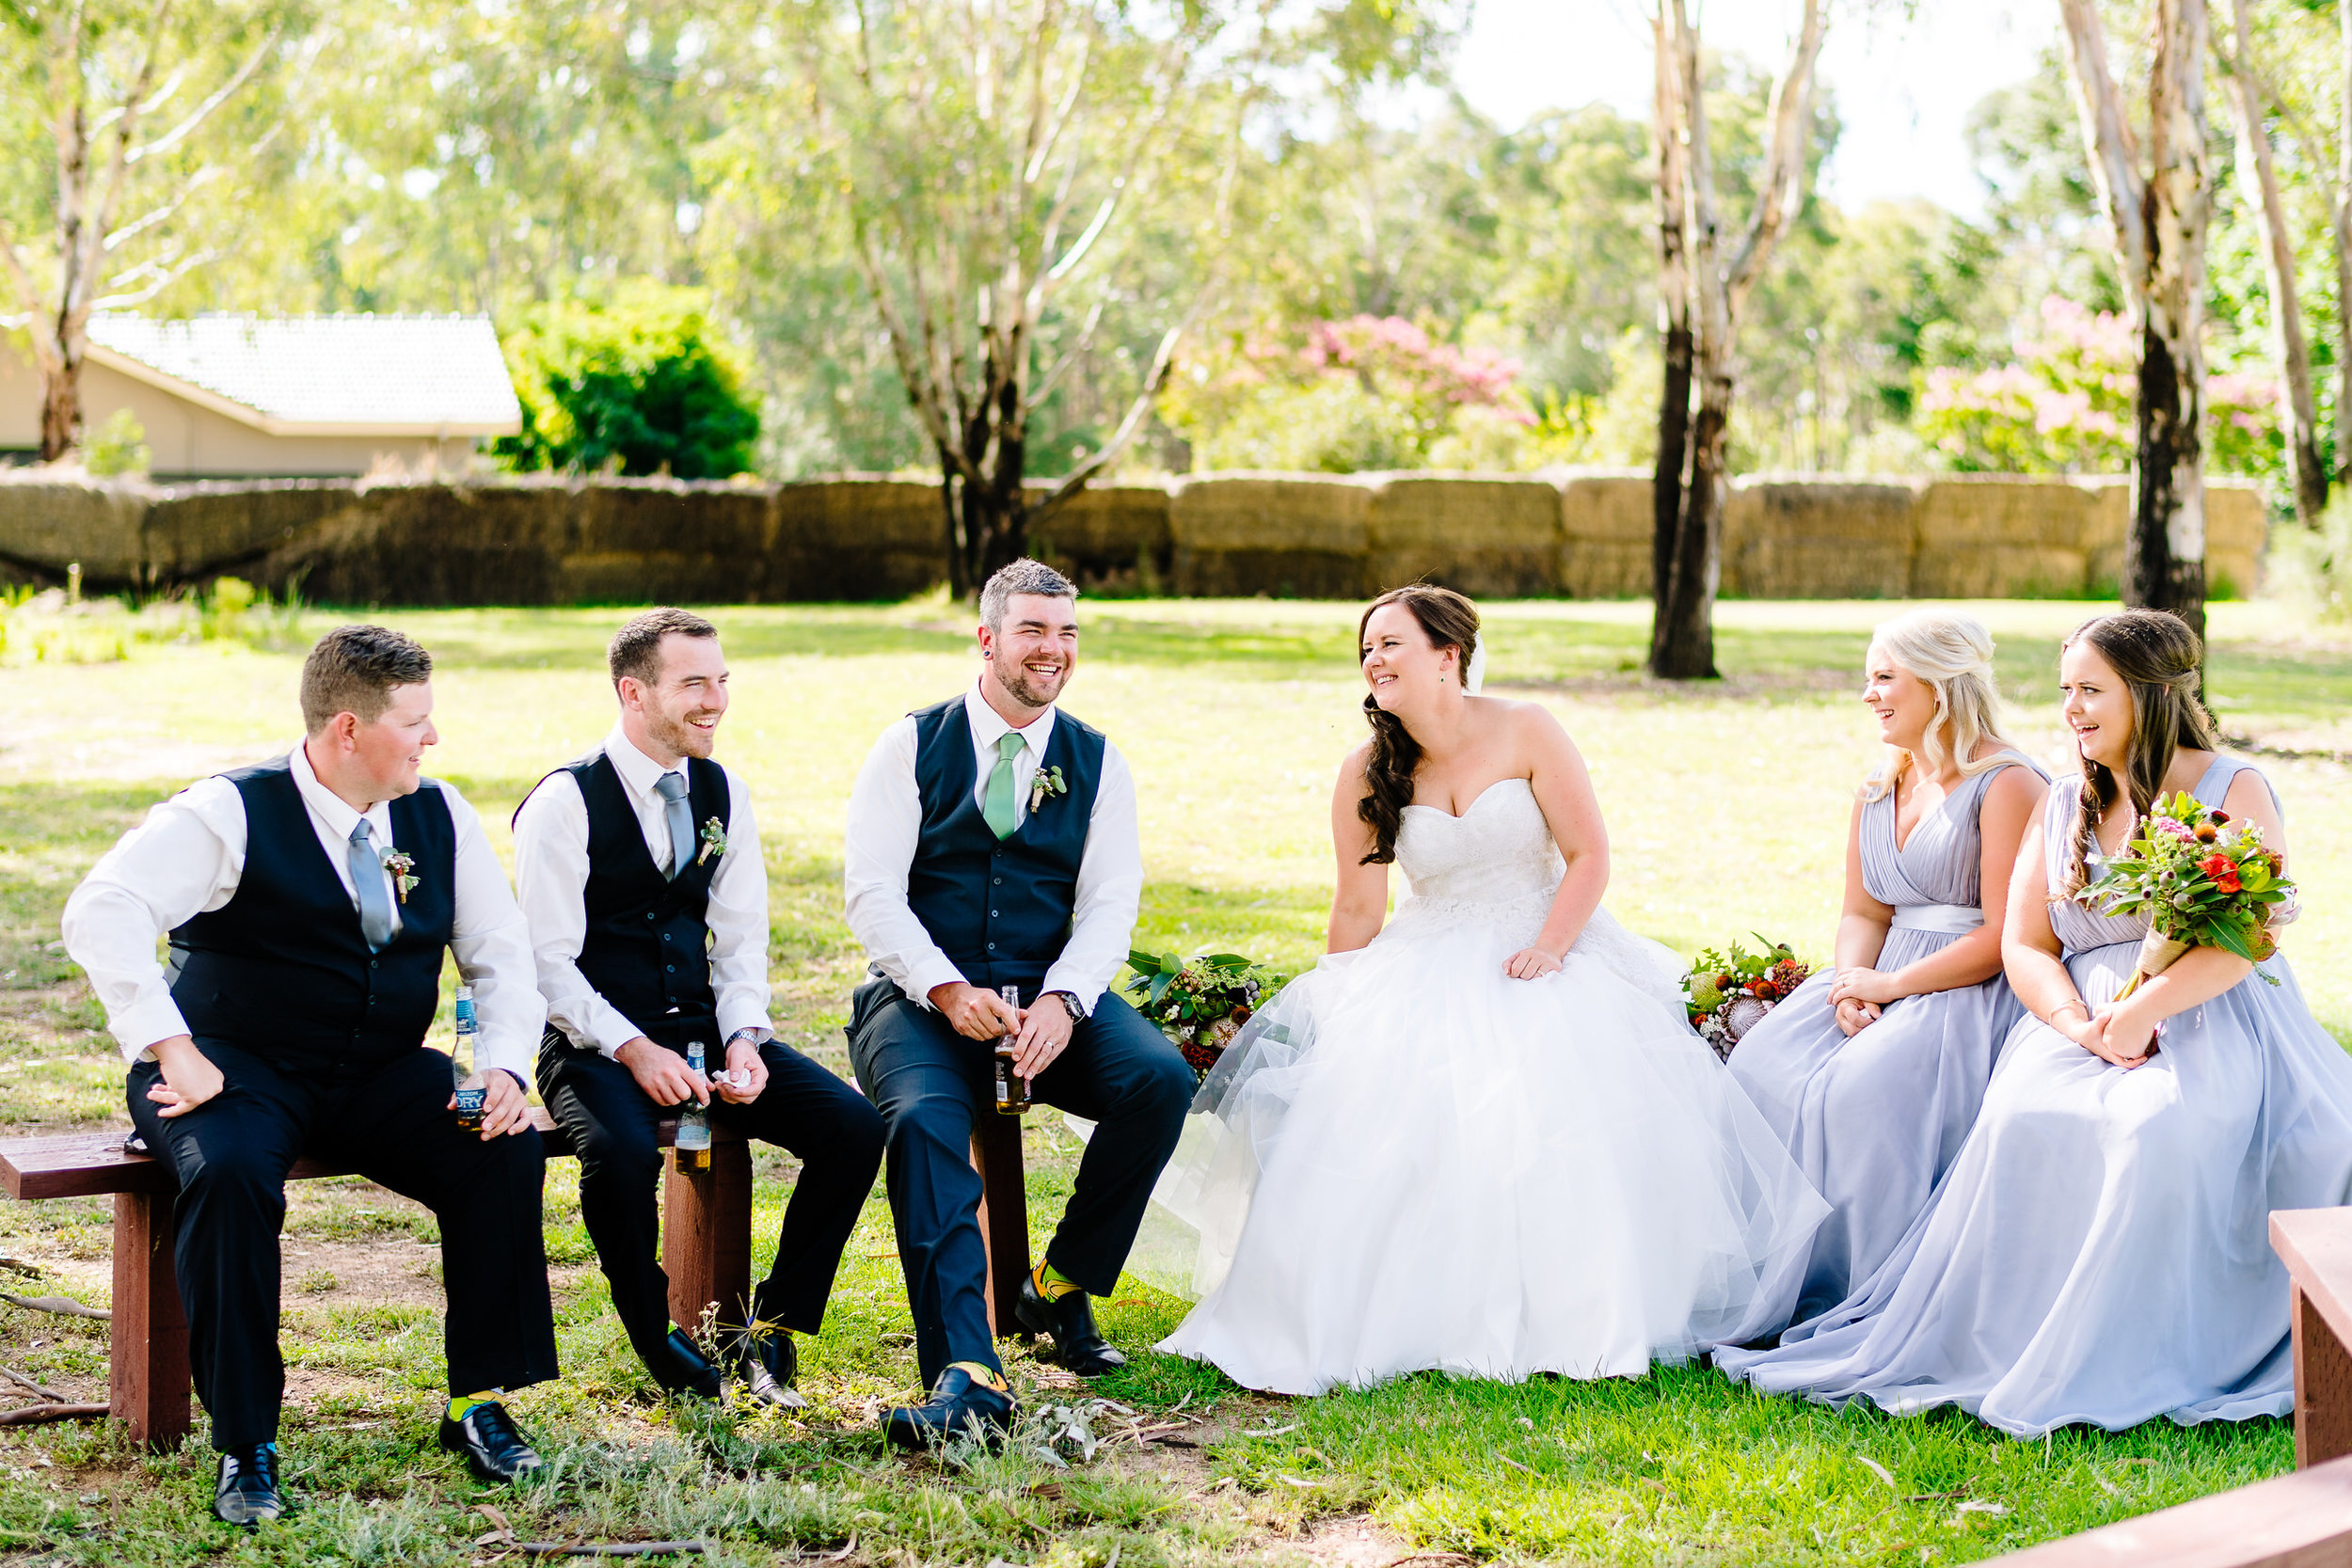 Justin_Jim_Echuca_Wedding_Photography_Tindarra-203.JPG